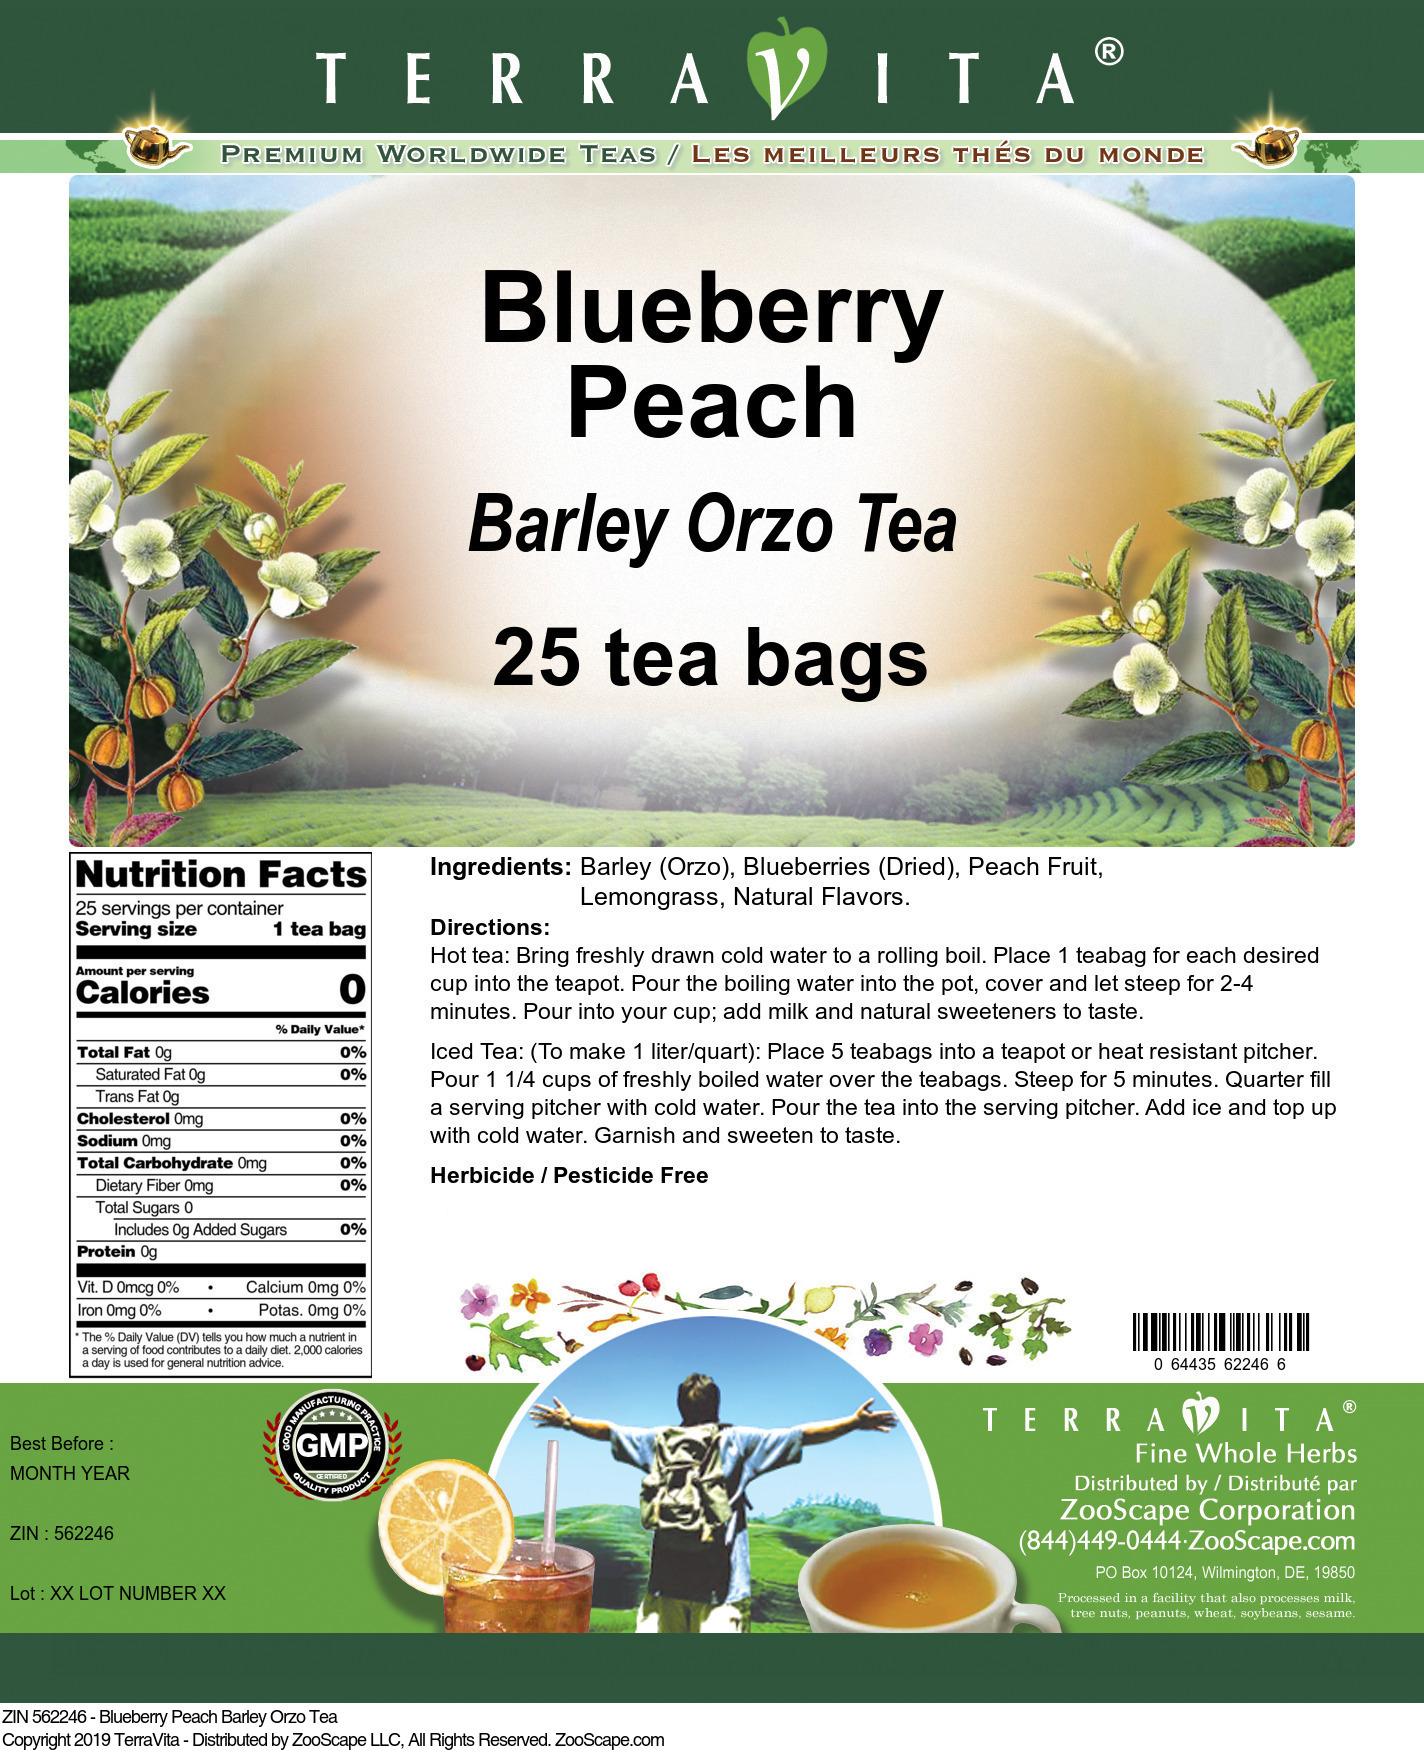 Blueberry Peach Barley Orzo